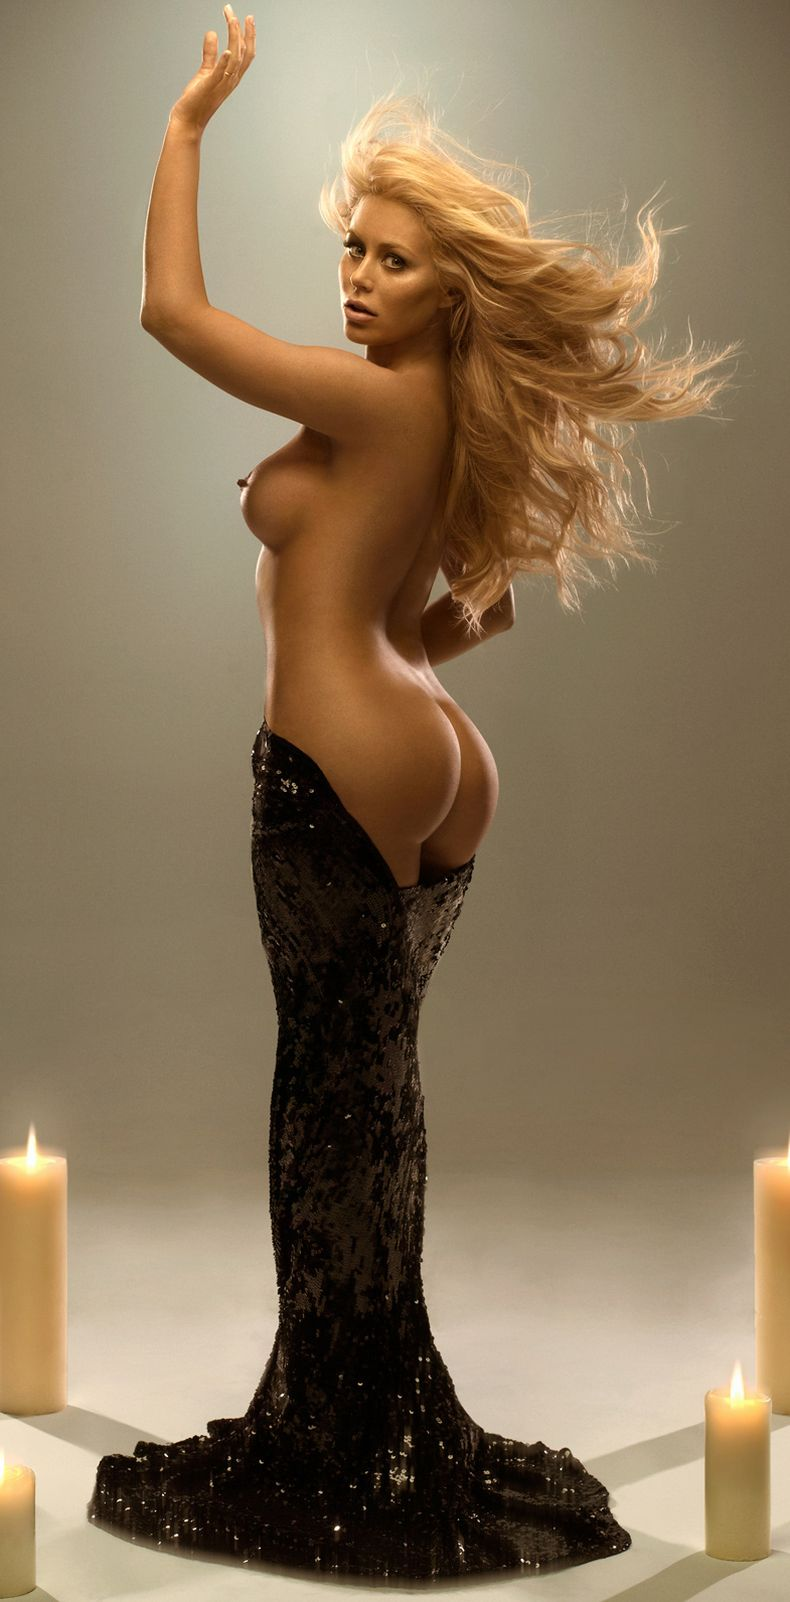 Aubrey o day leaked nude, light sperm uv